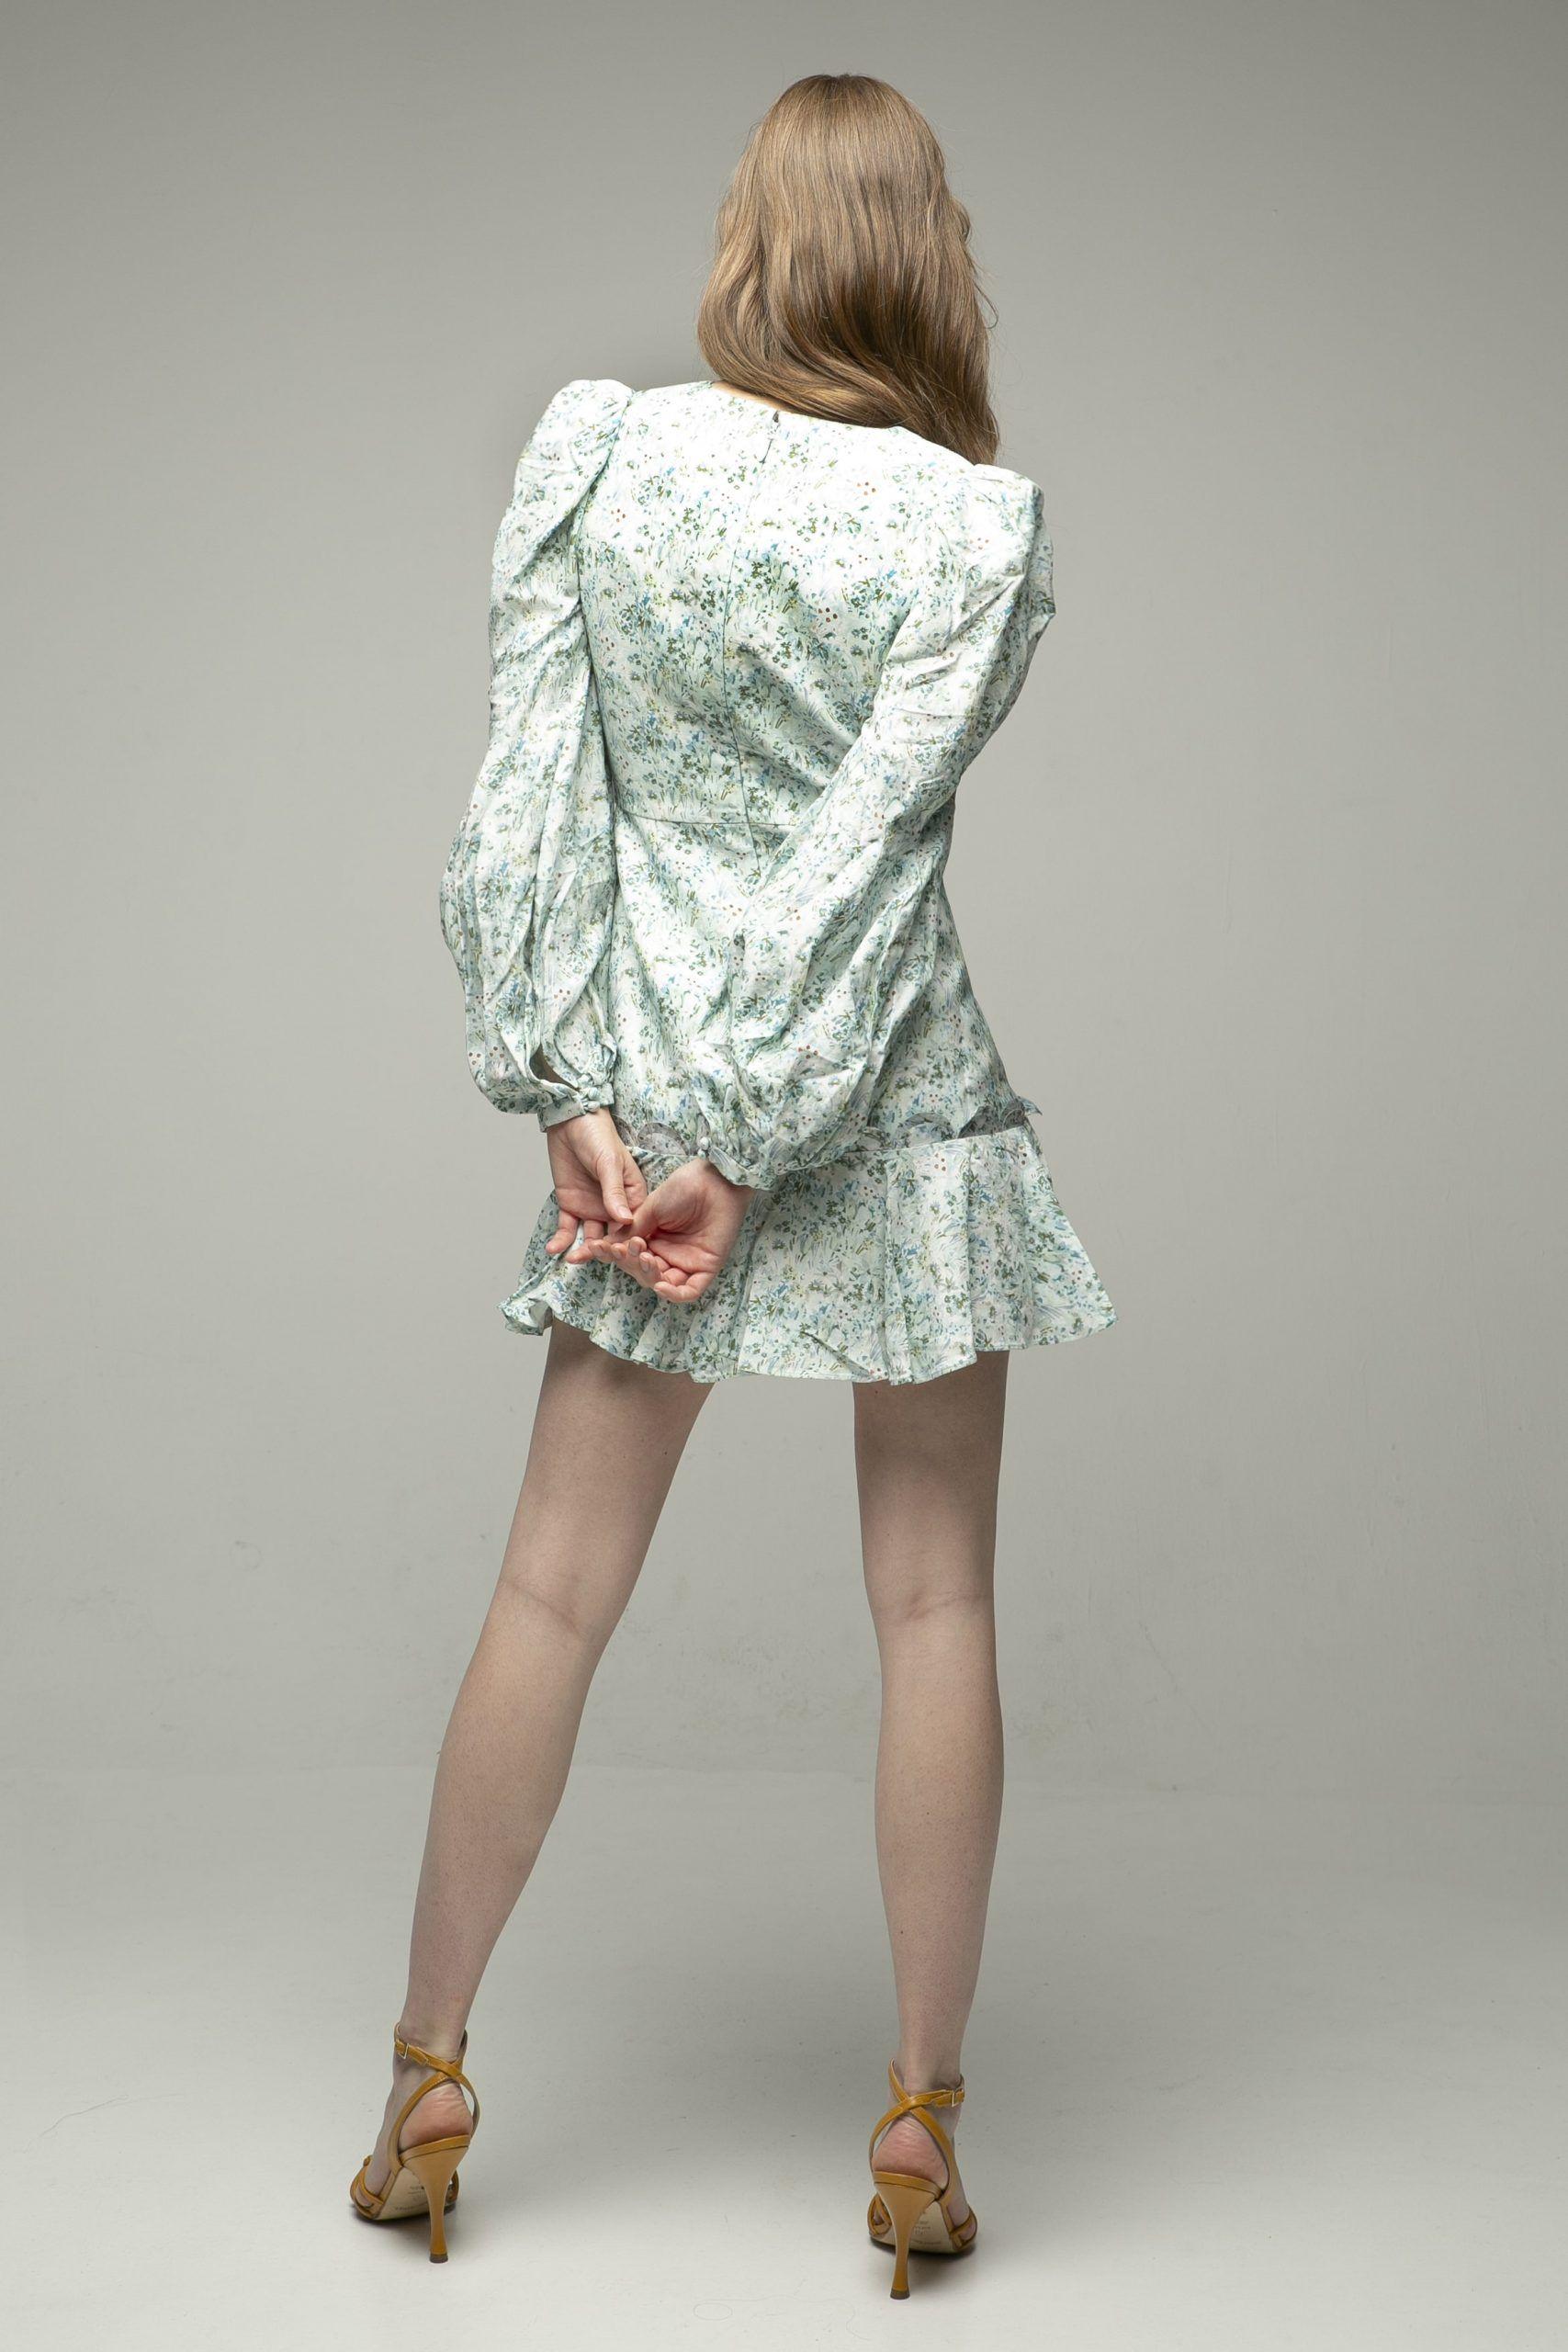 acler-dixon-vestido-corto-azul-florecitas-3